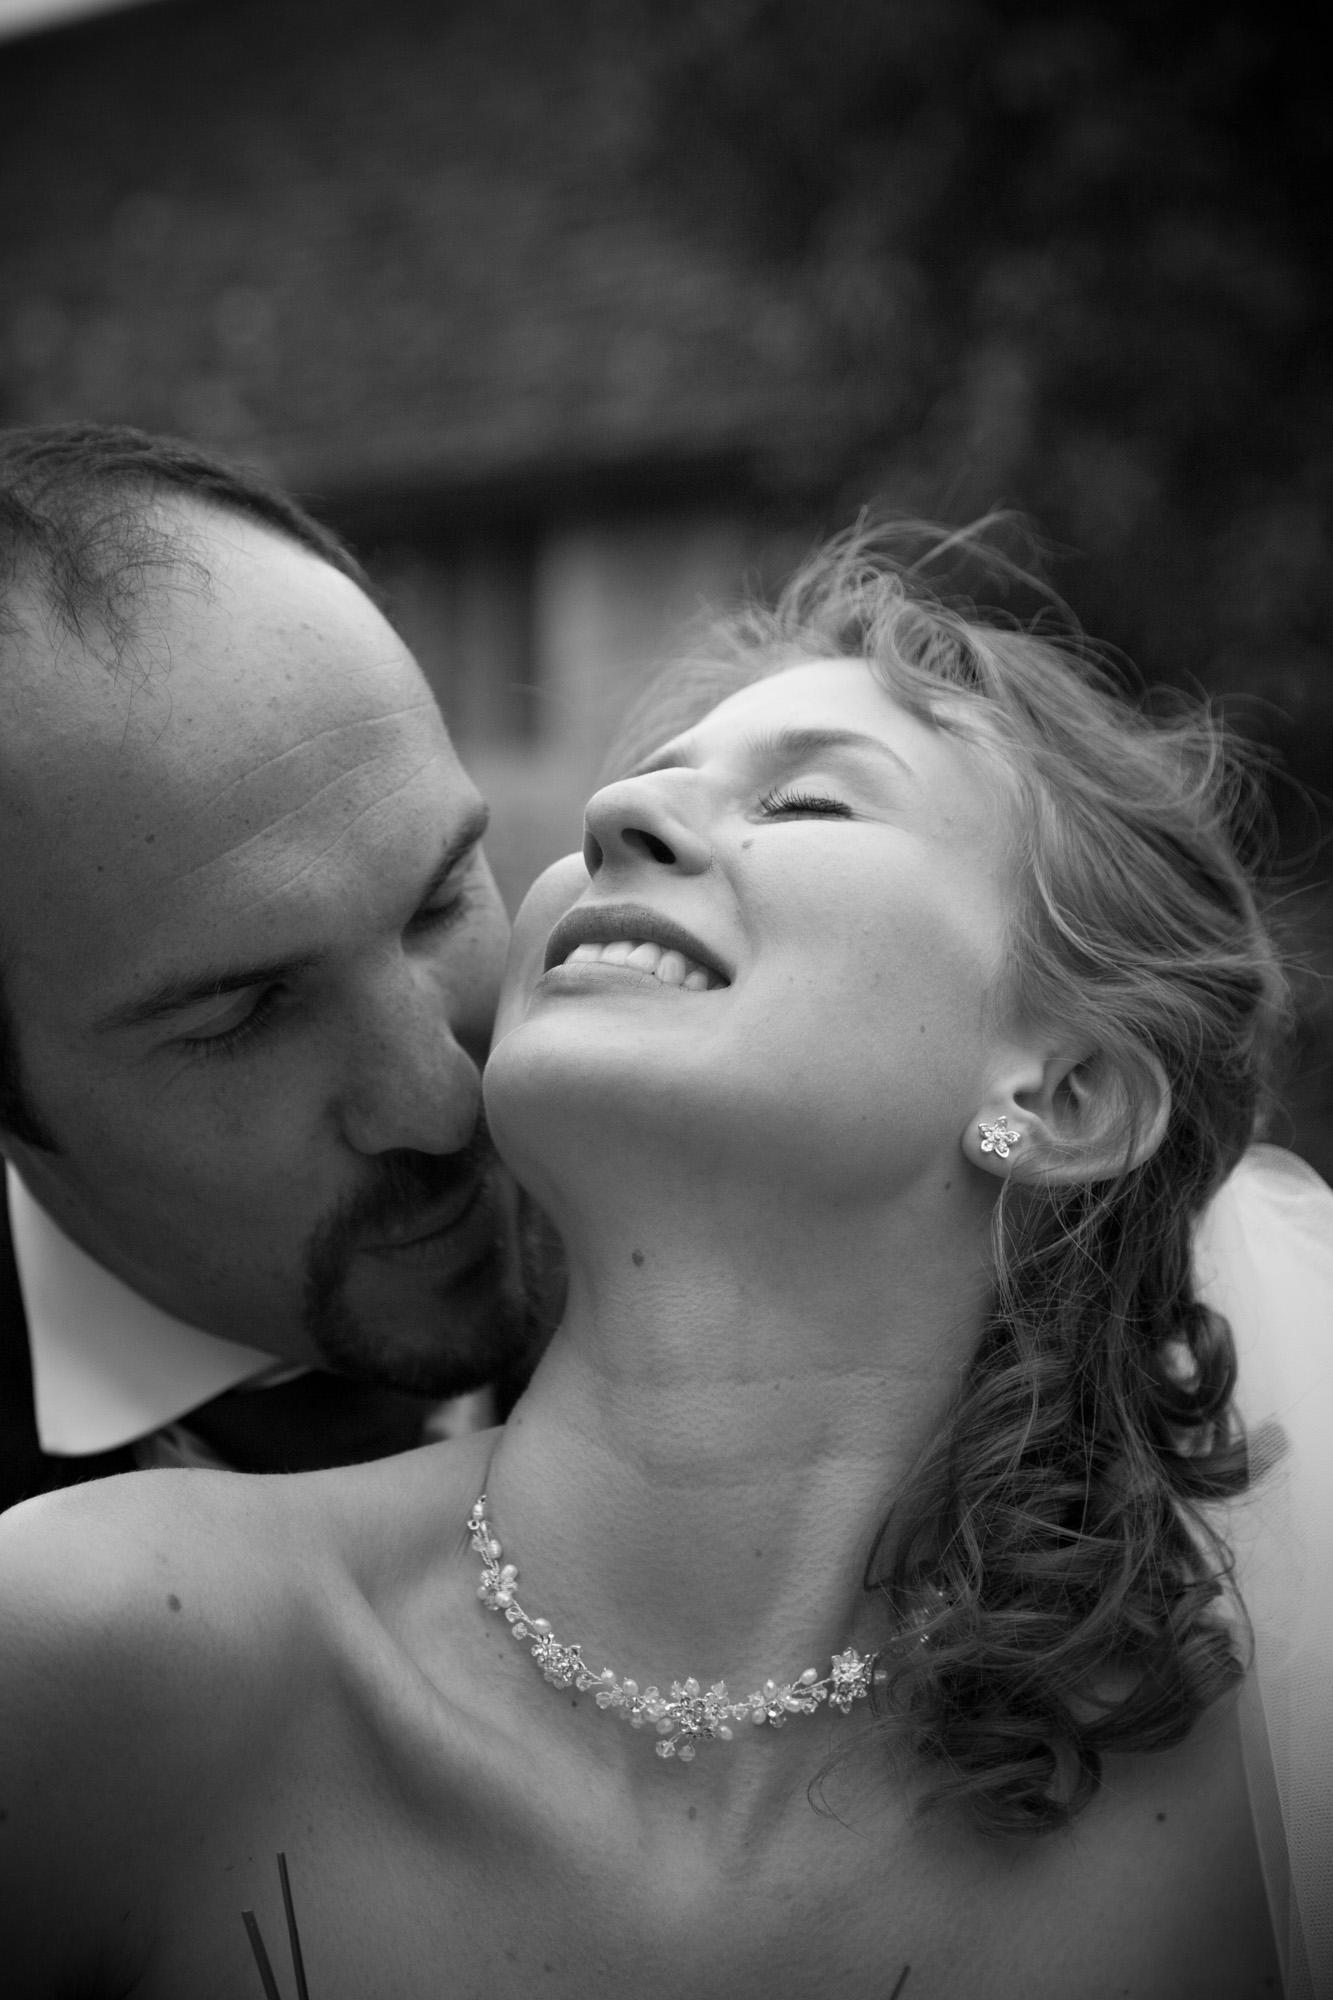 weddings-couples-love-photographer-oxford-london-jonathan-self-photography-62.jpg